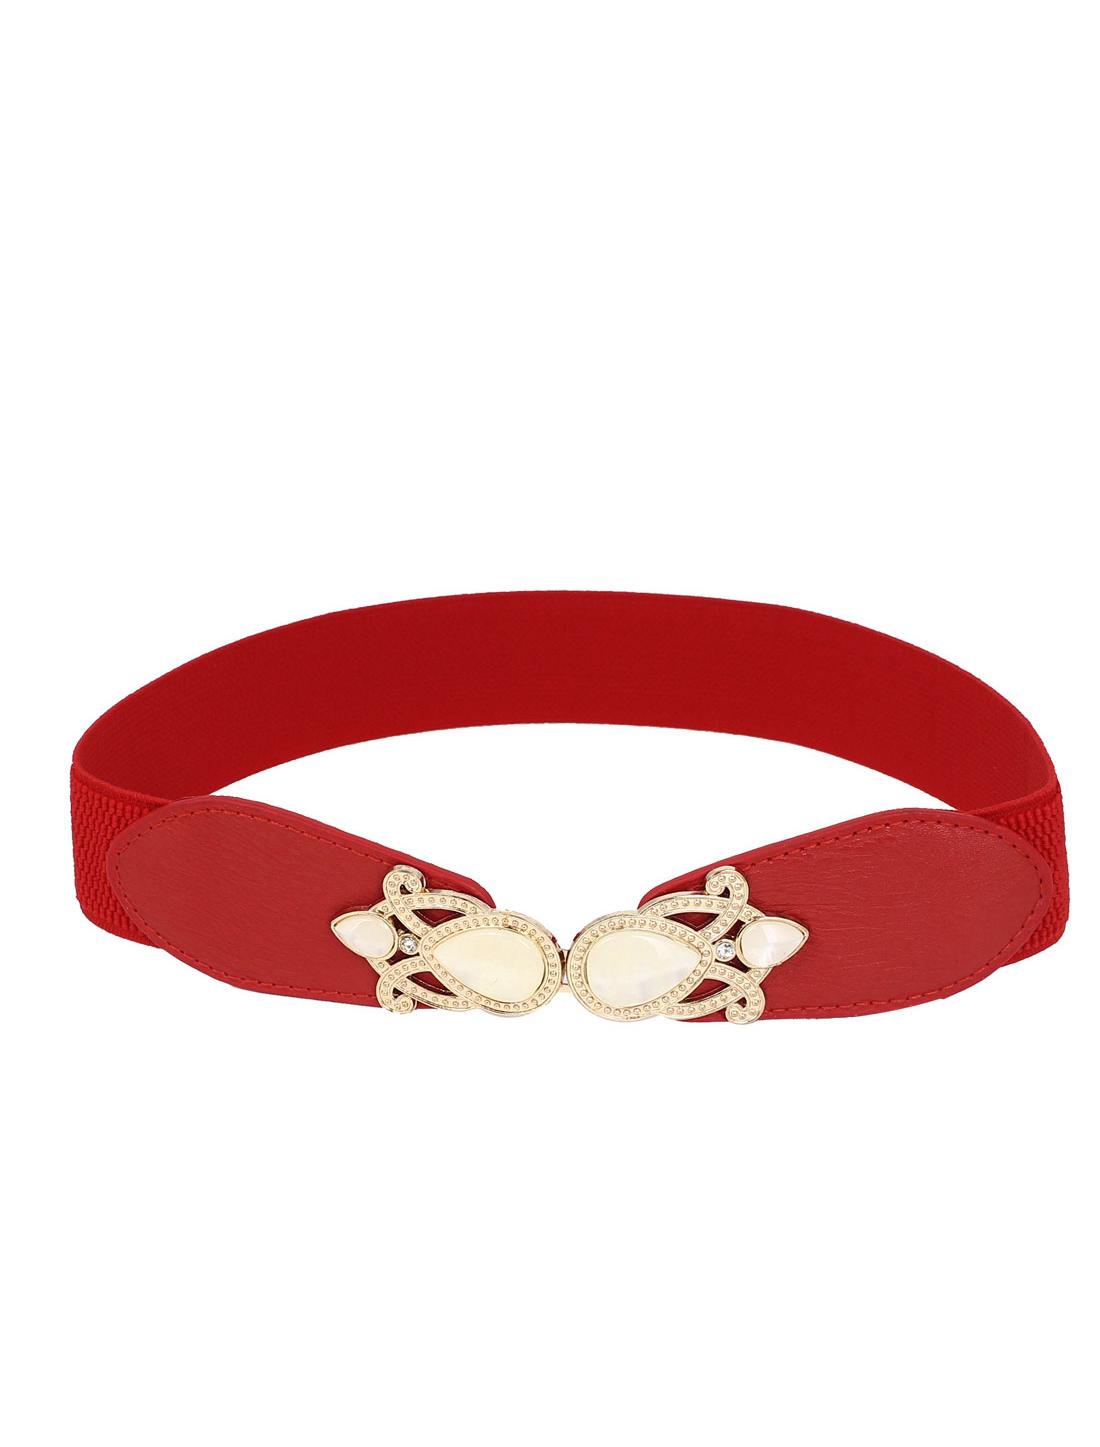 Women Imitation Pearl Decor Metal Interlocking Buckle Faux Leather 4cm Width Stretchy Cinch Waist Belt Waistband Red